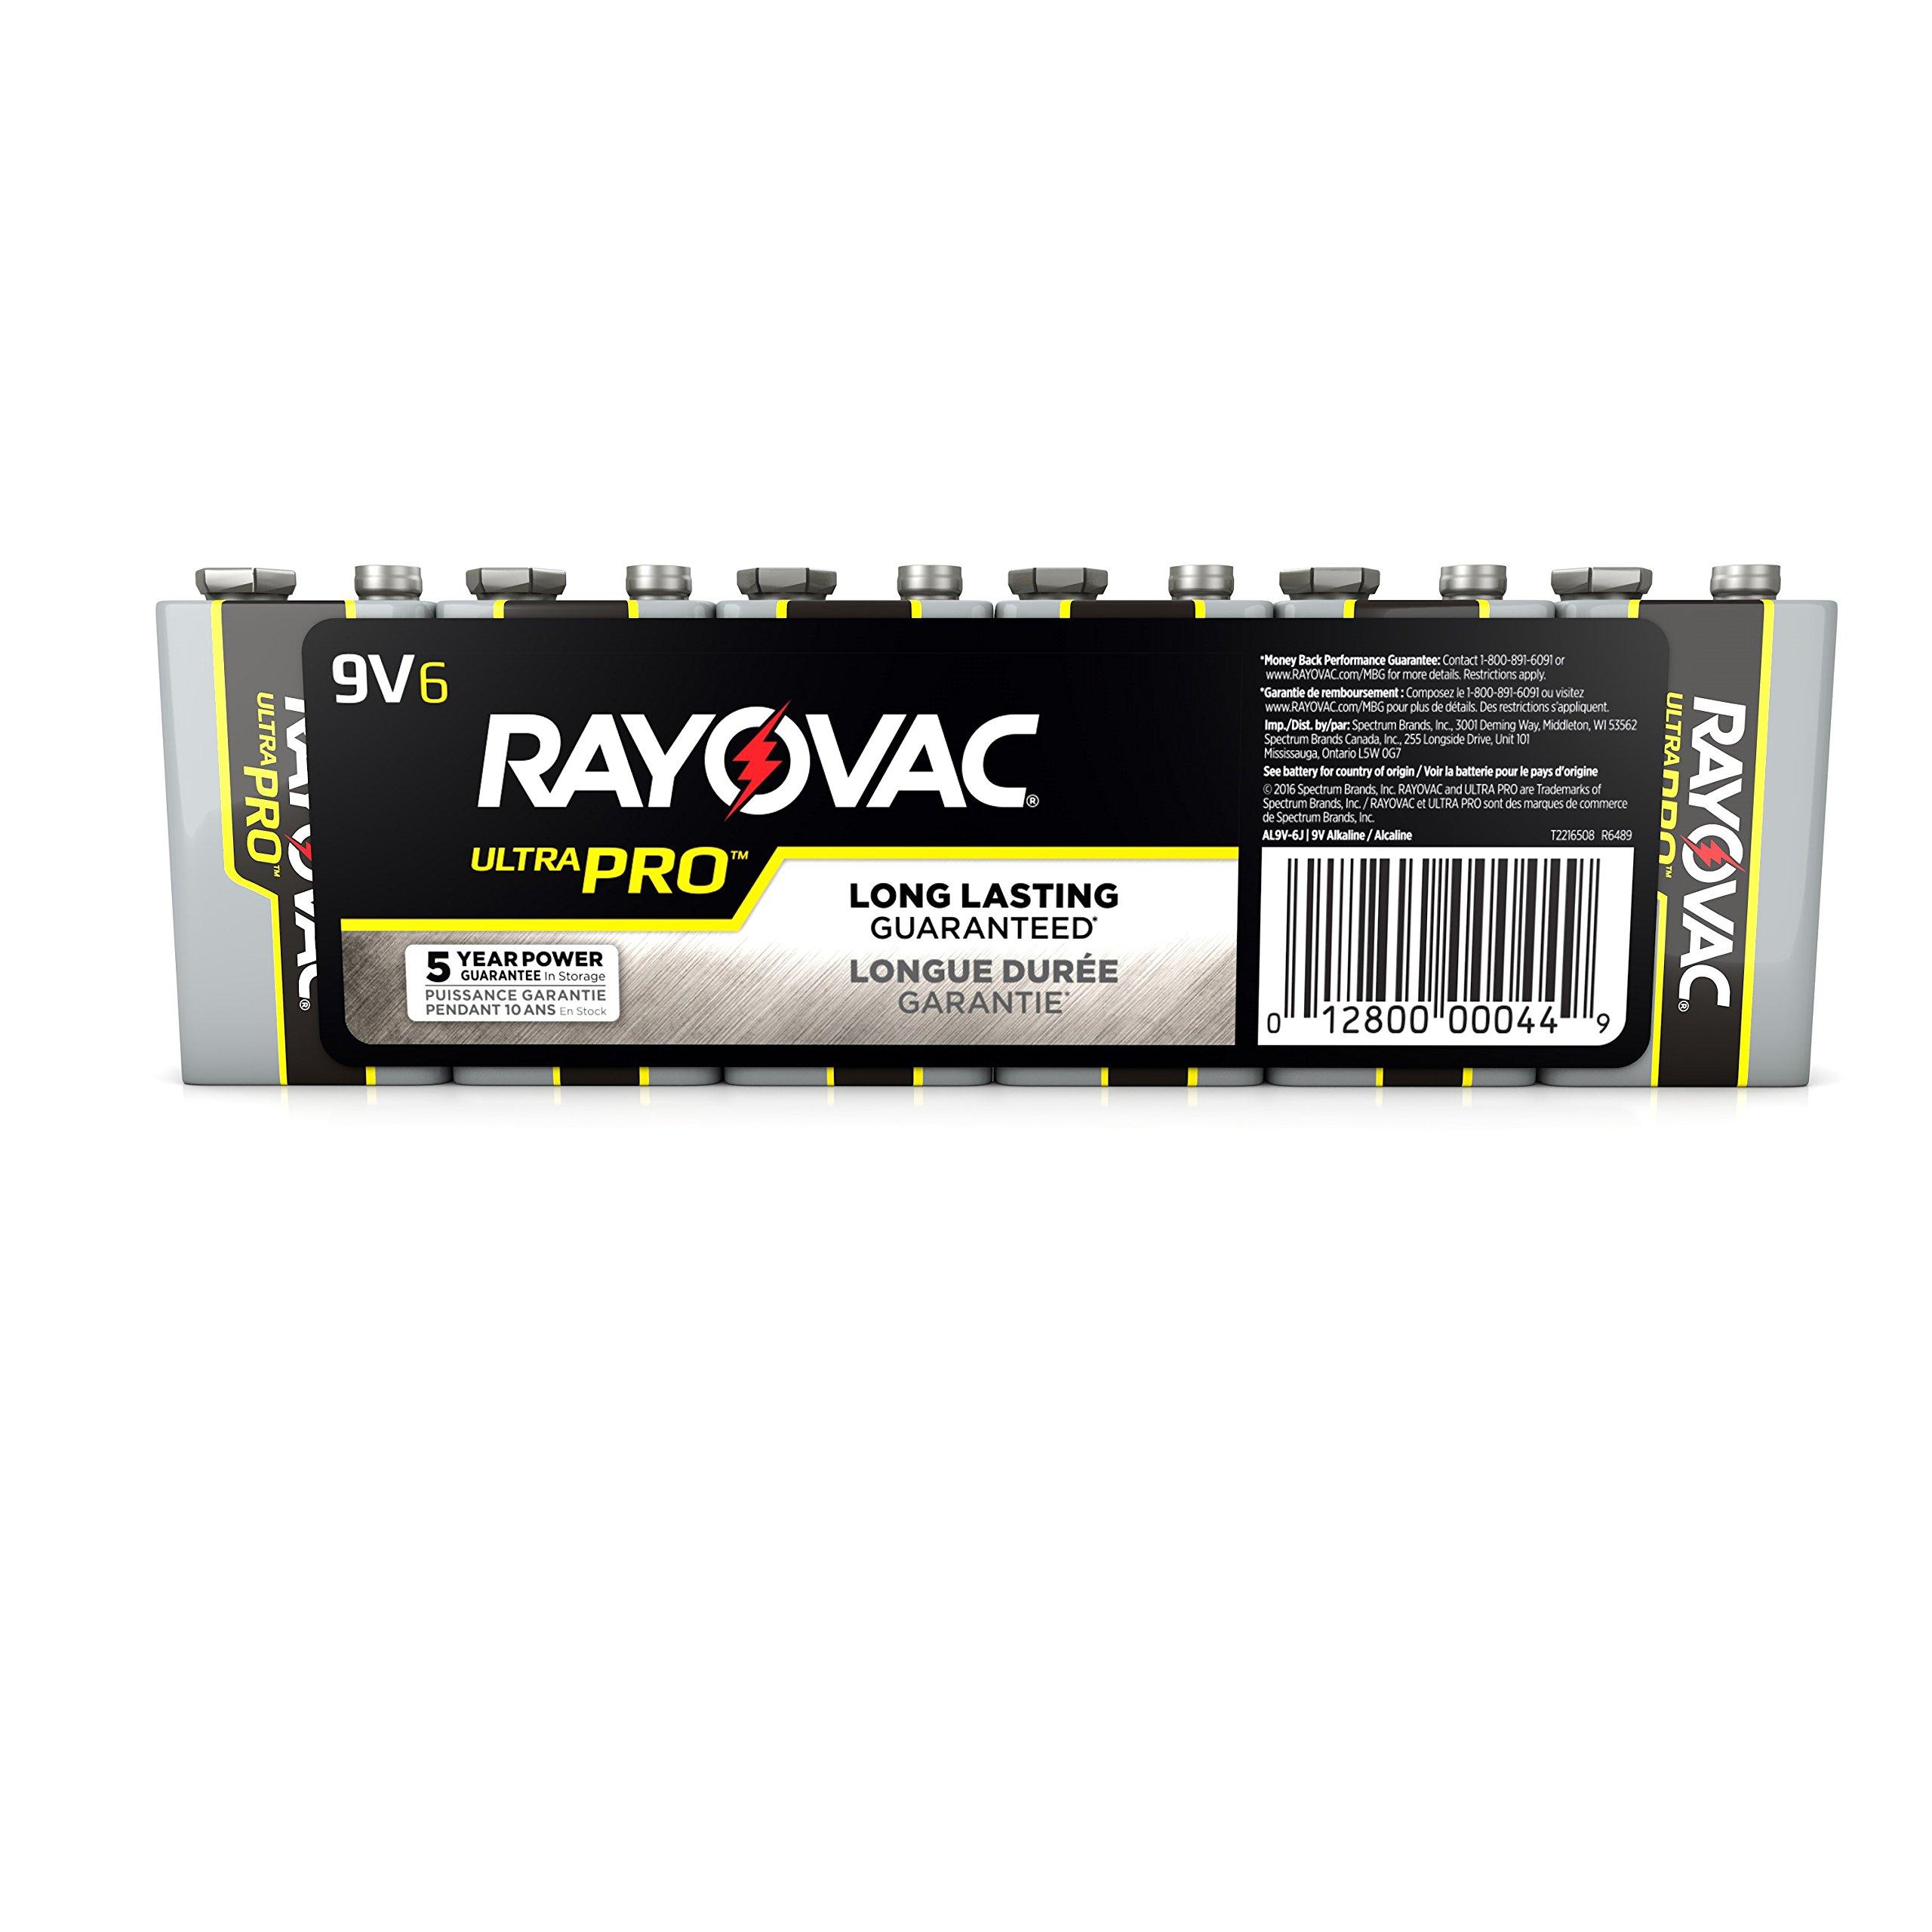 Rayovac Alkaline Battery 9 V 6 Pack